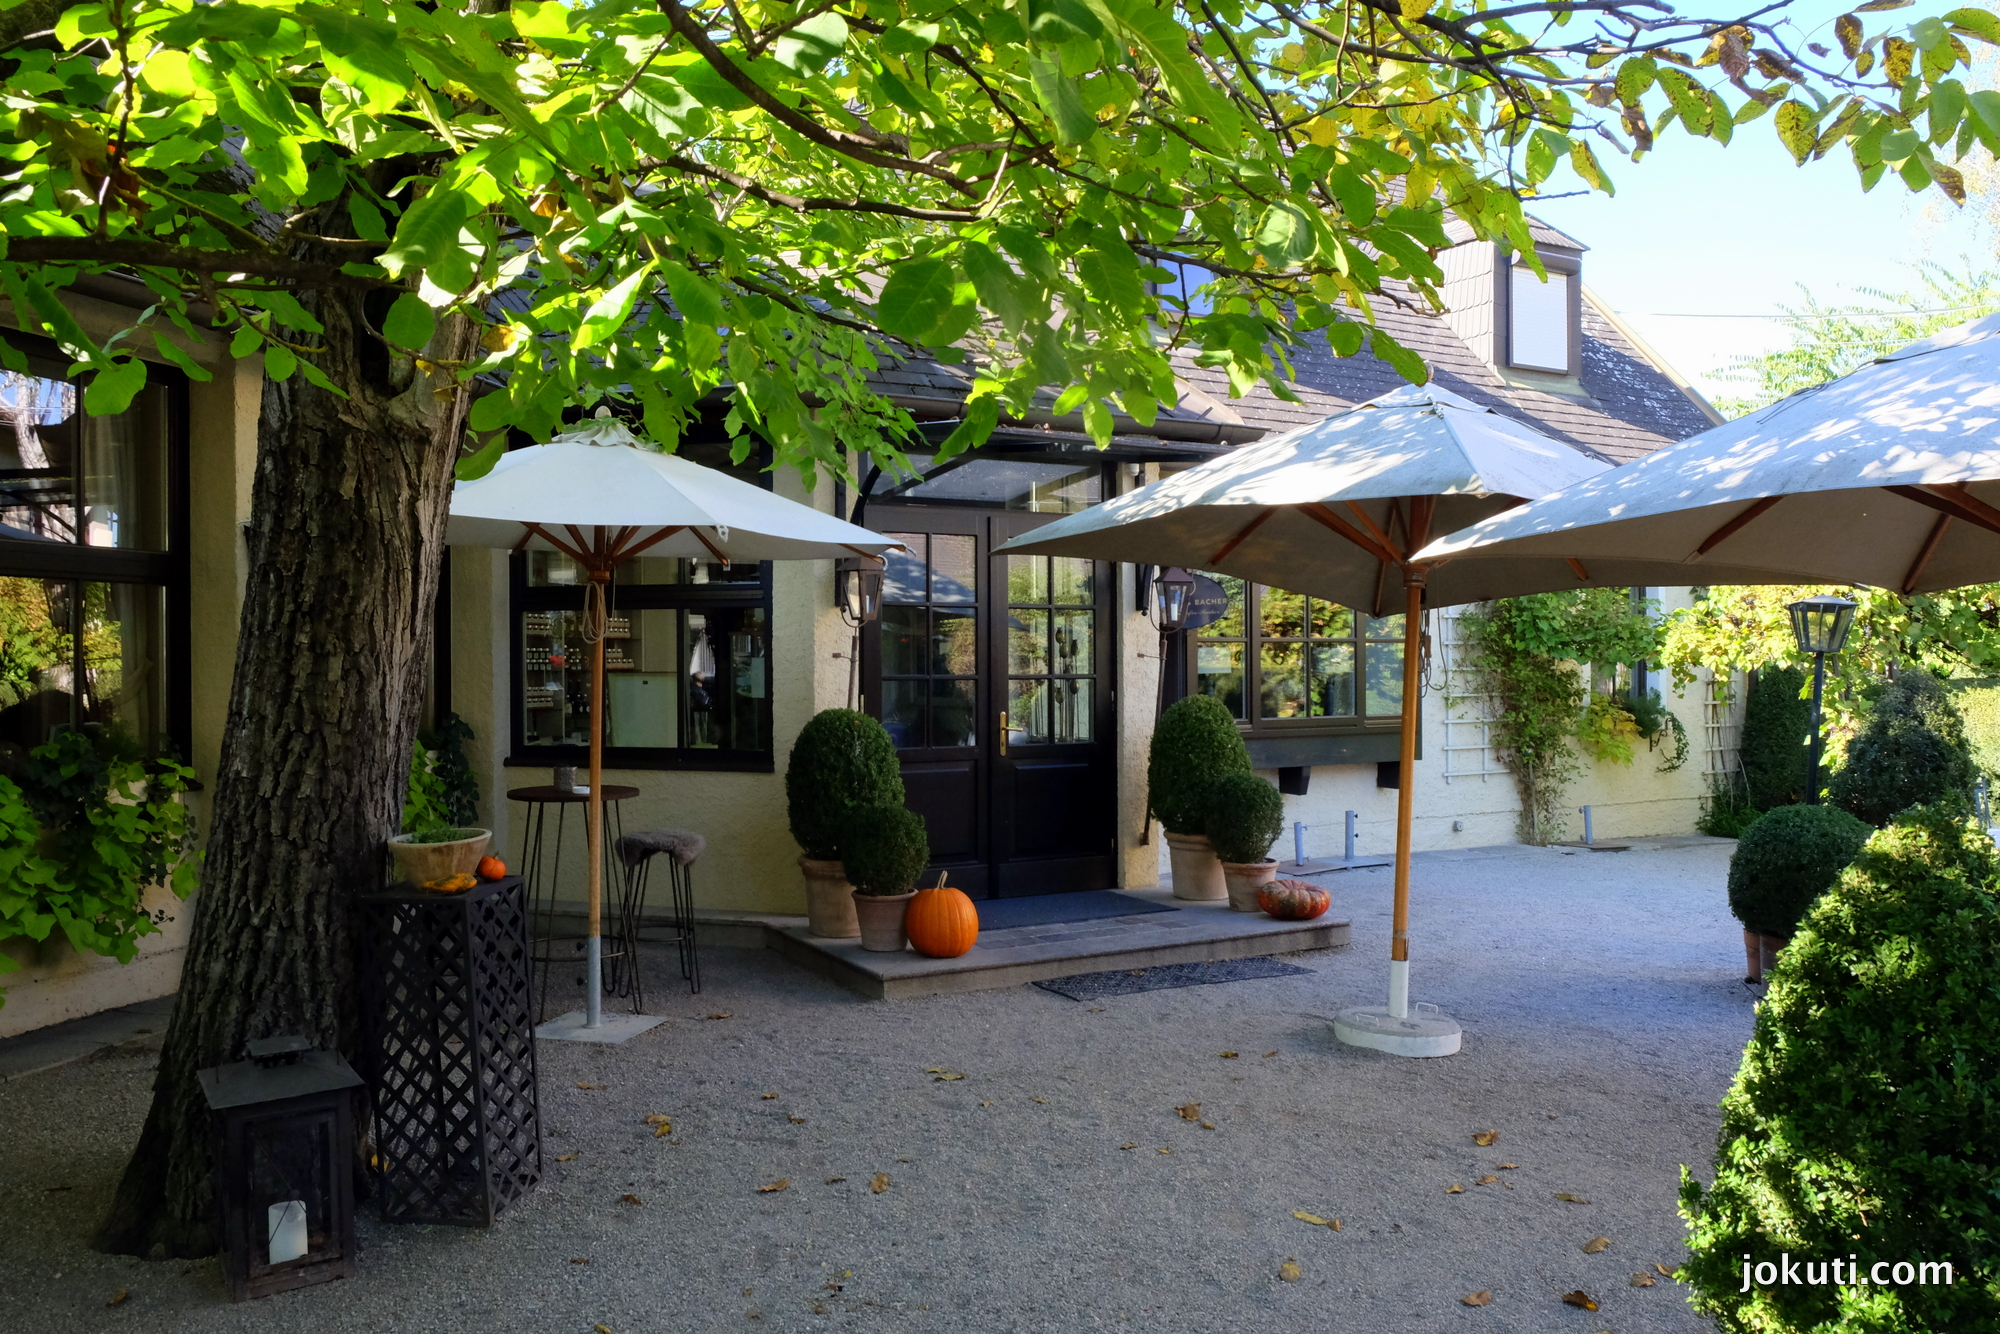 dscf7725_ausztria_austria_vilagevo_jokuti_landhaus_bacher_dorfer_mautern_wachau_reitbauer_restaurant.jpg